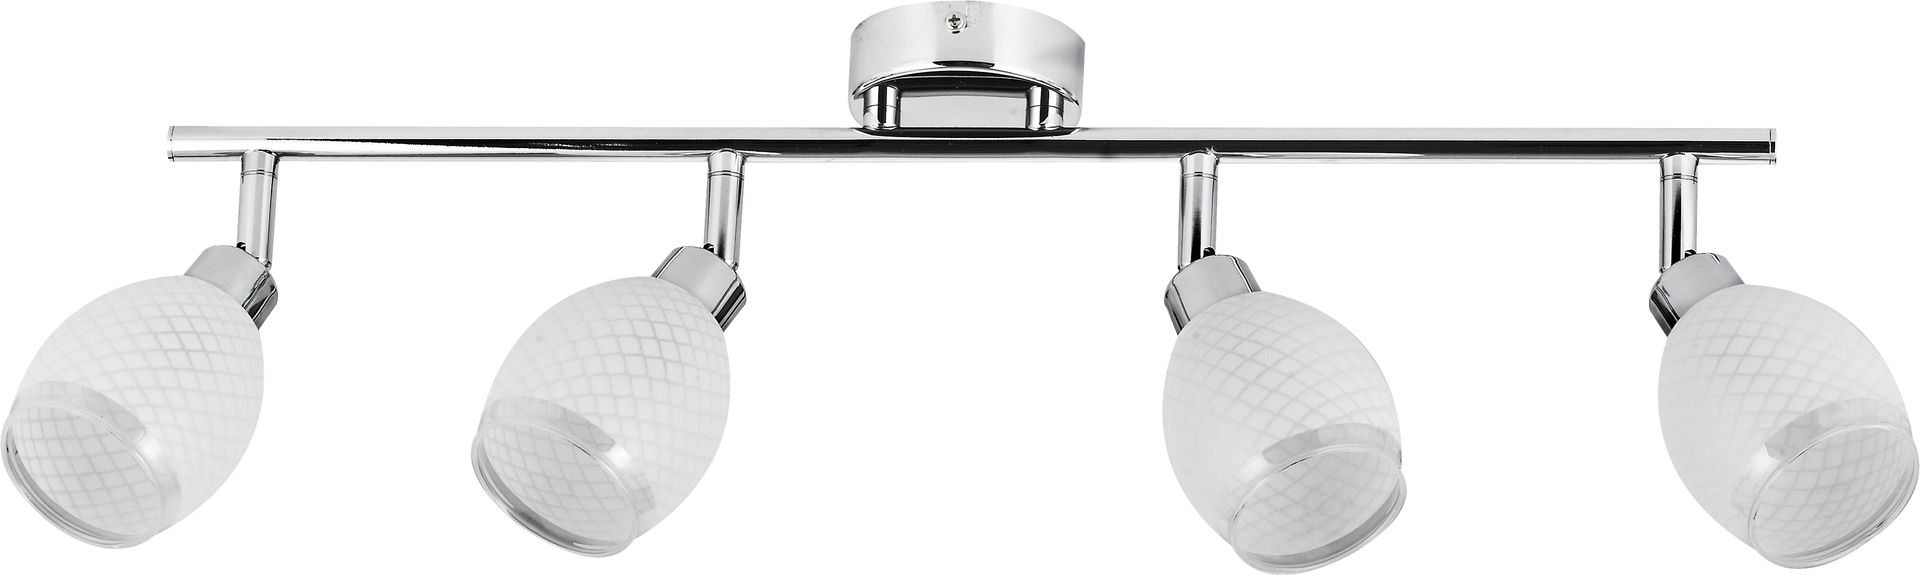 Lampa Gernet Listwa 4X40W G9 Chrom